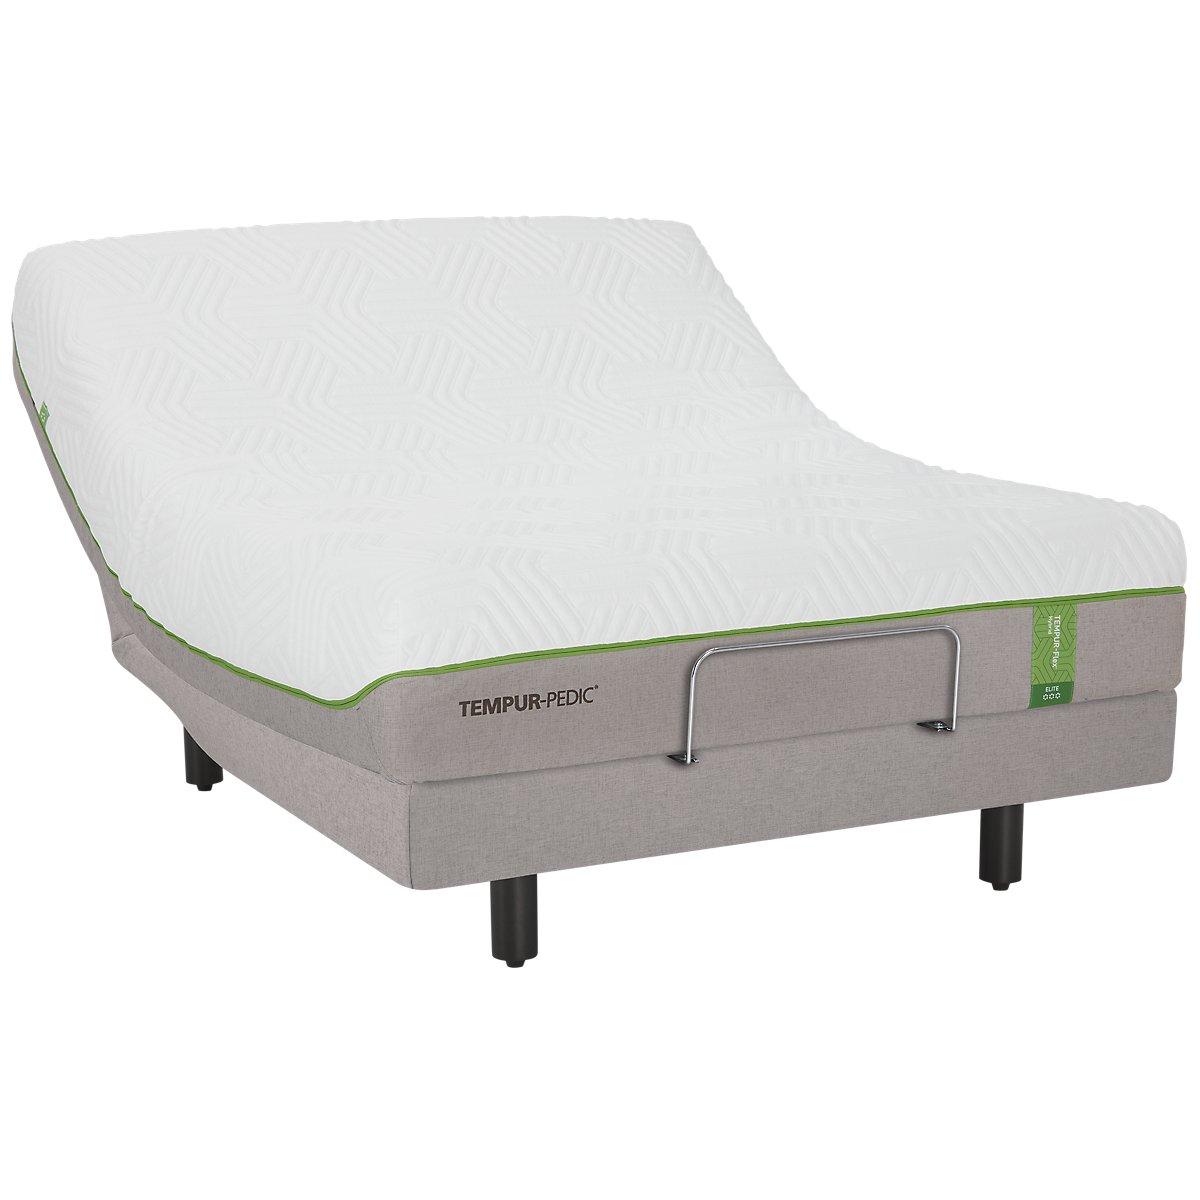 City furniture tempur flex elite mattress for Furniture mattress city